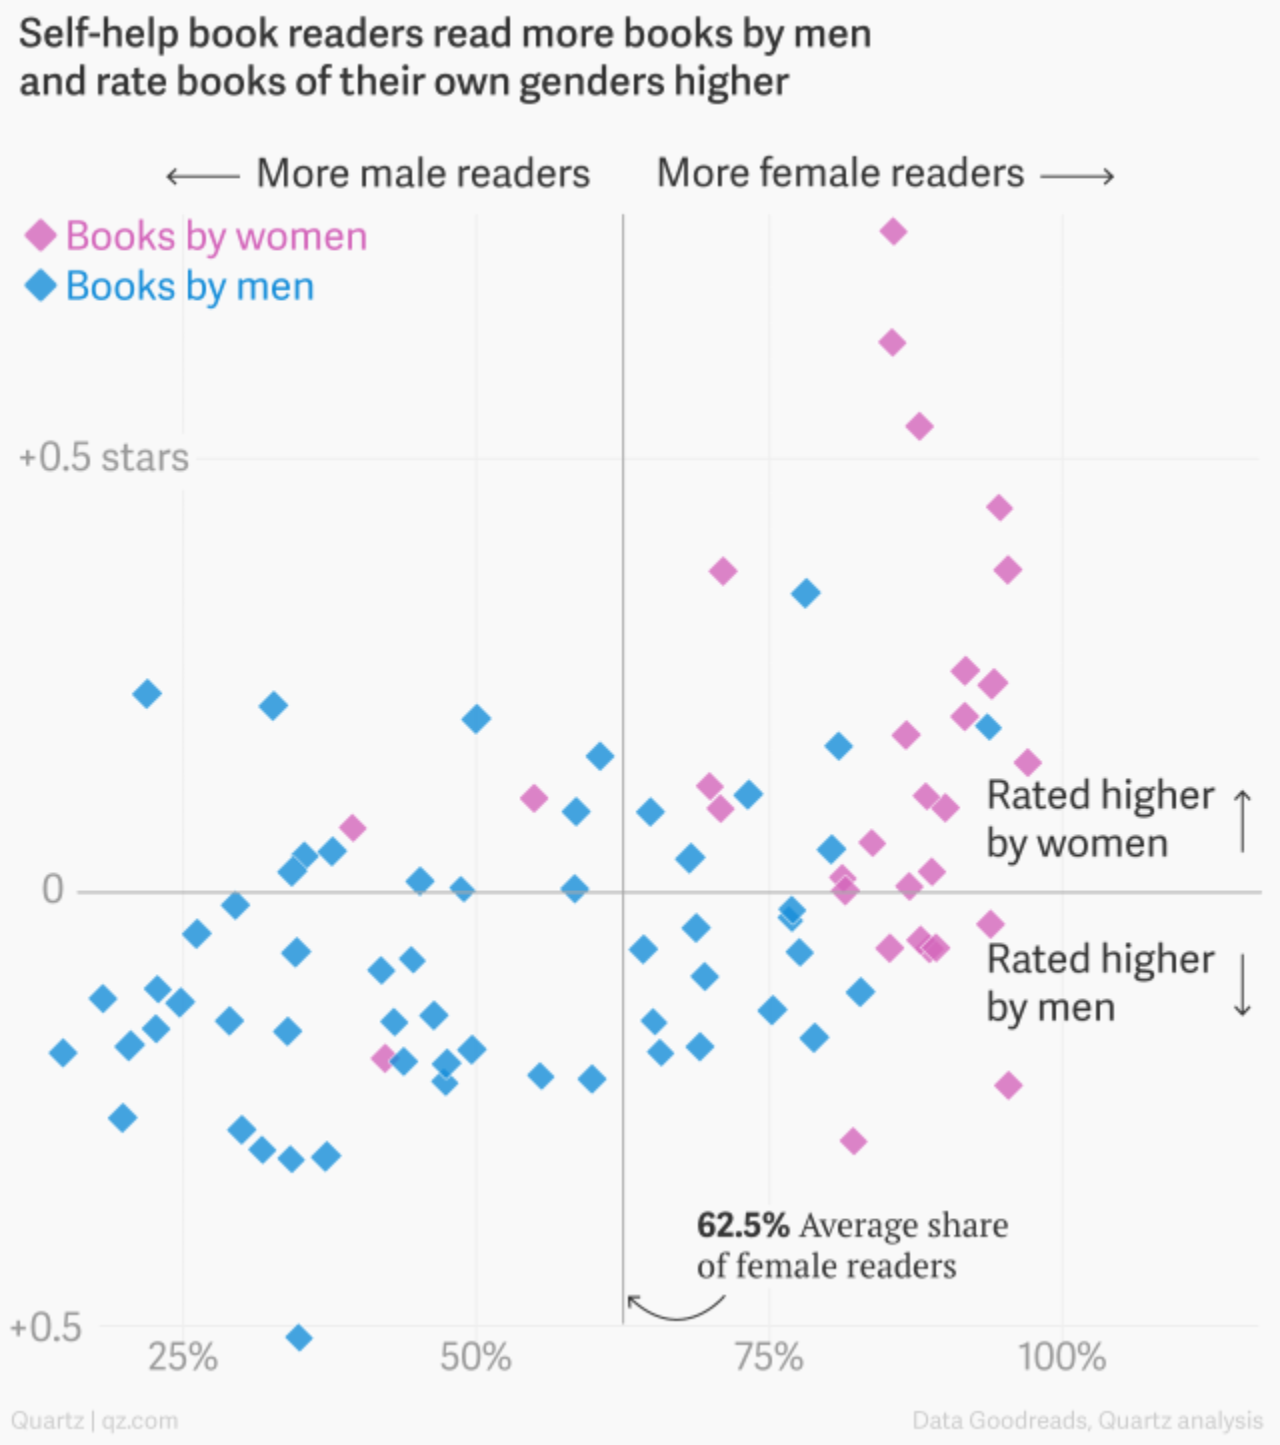 Who reads self-help books